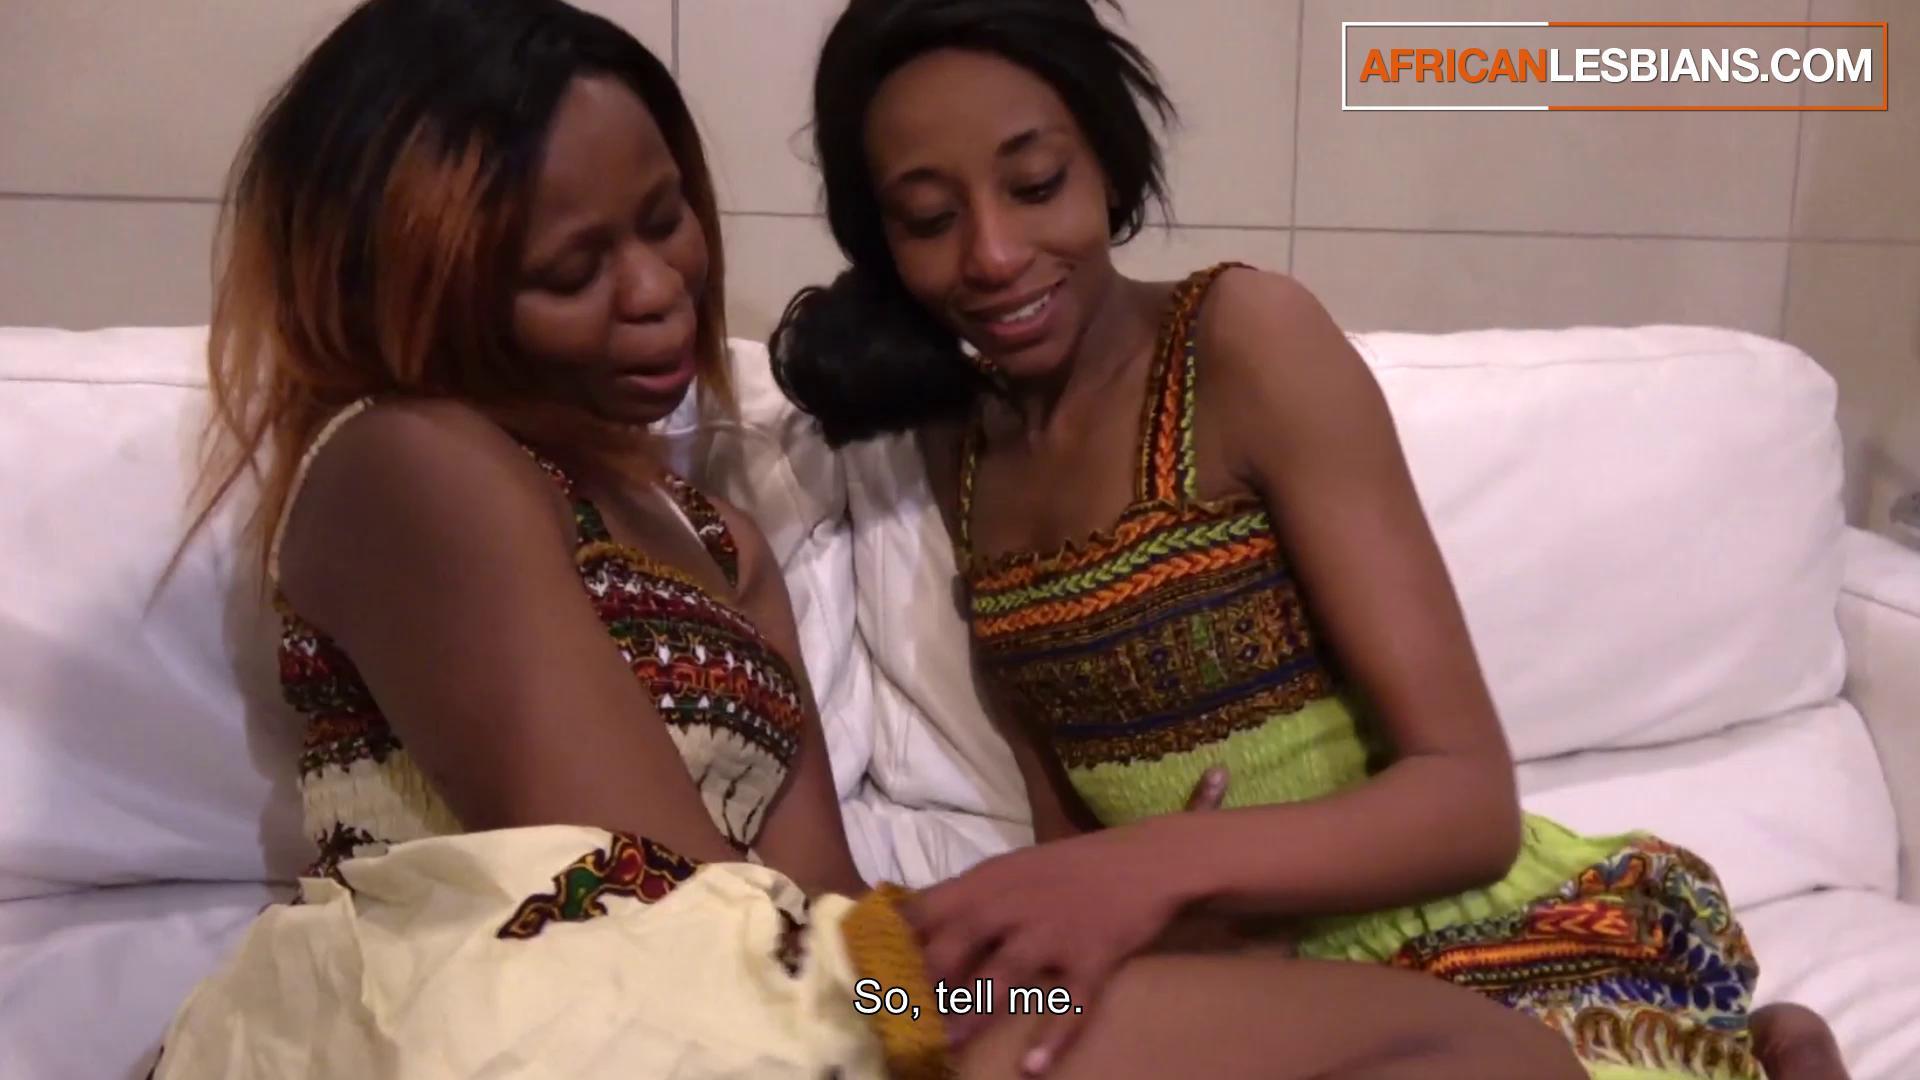 Bbw Ebony Milf Lesbians